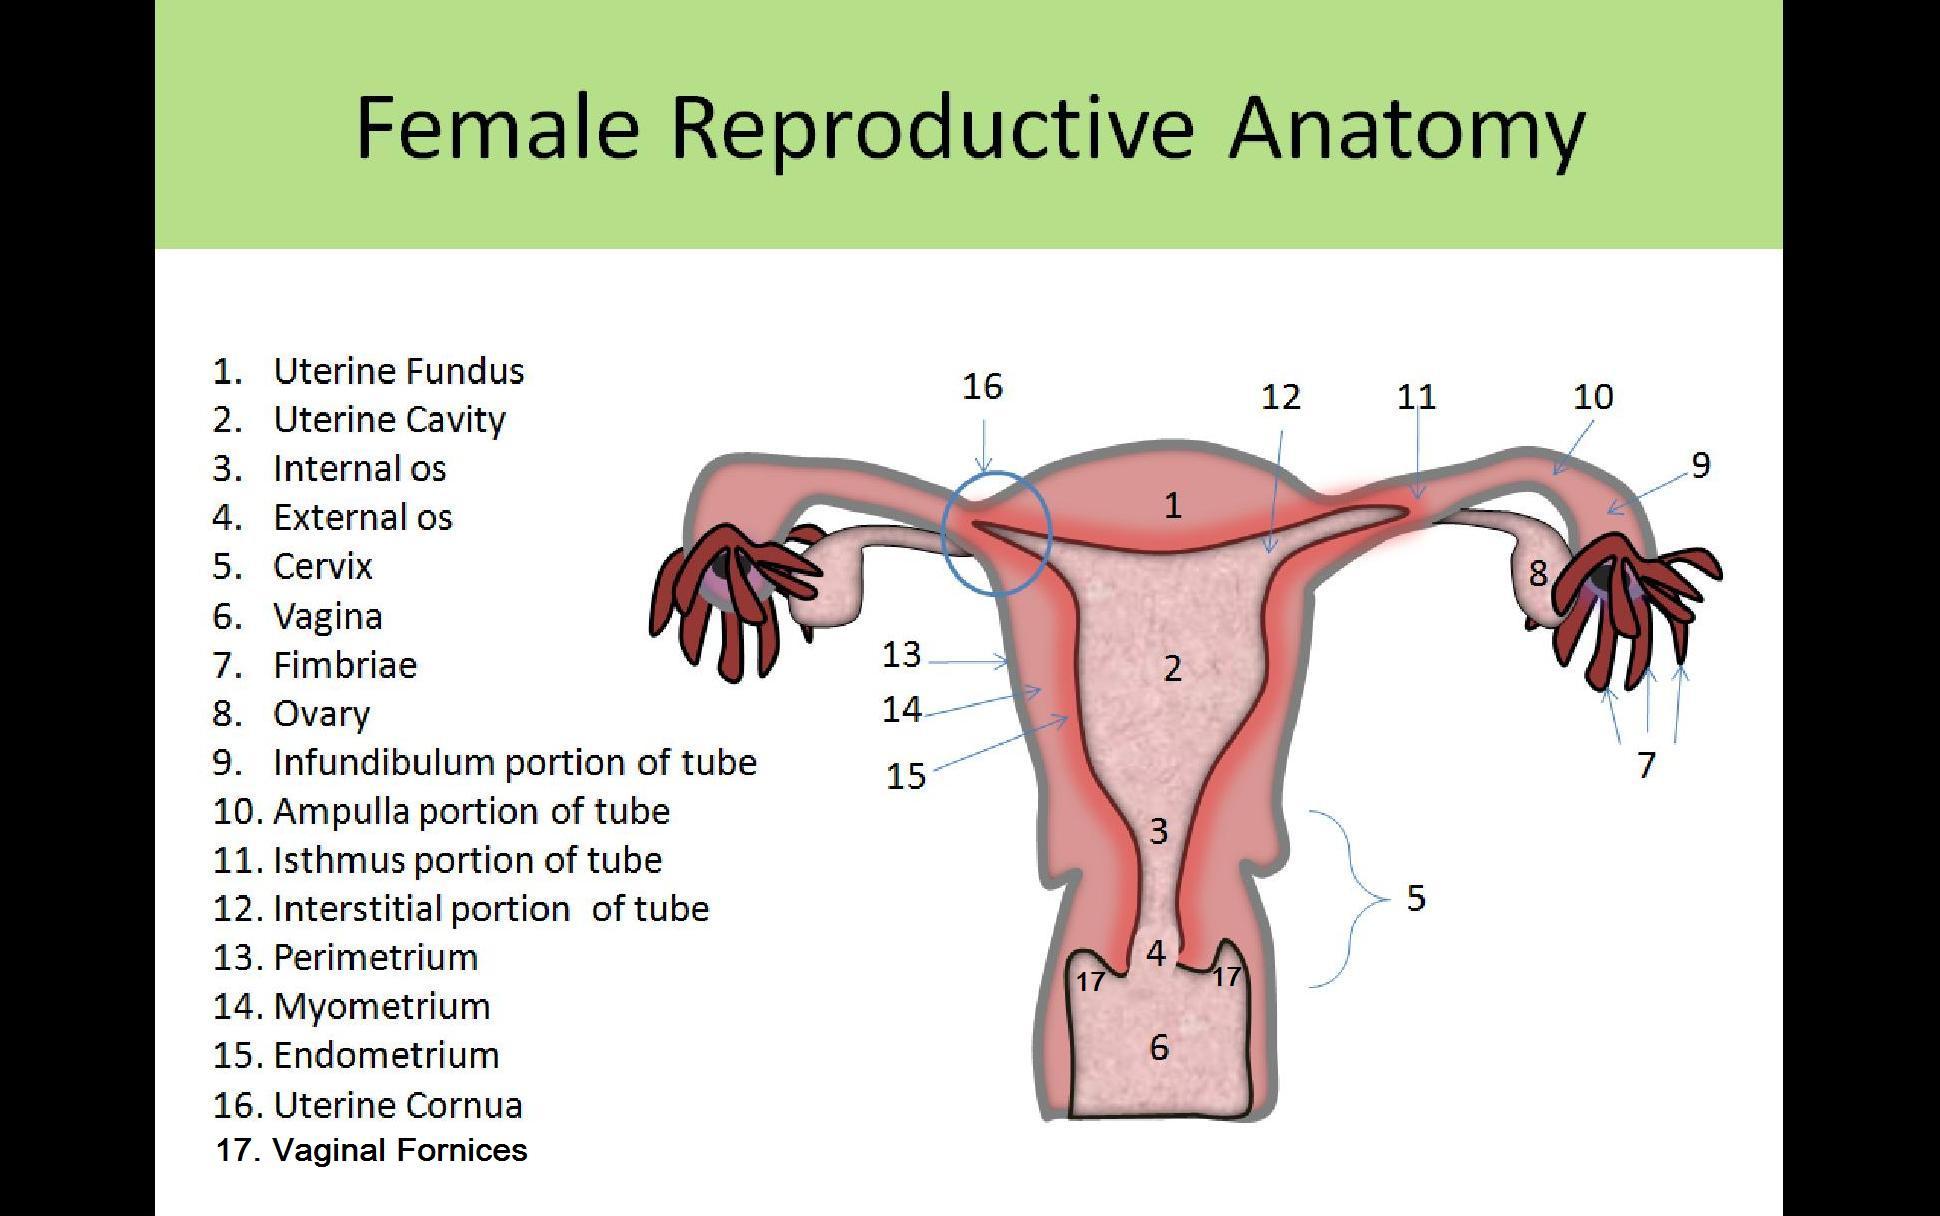 Ultrasound Registry Review - General Information